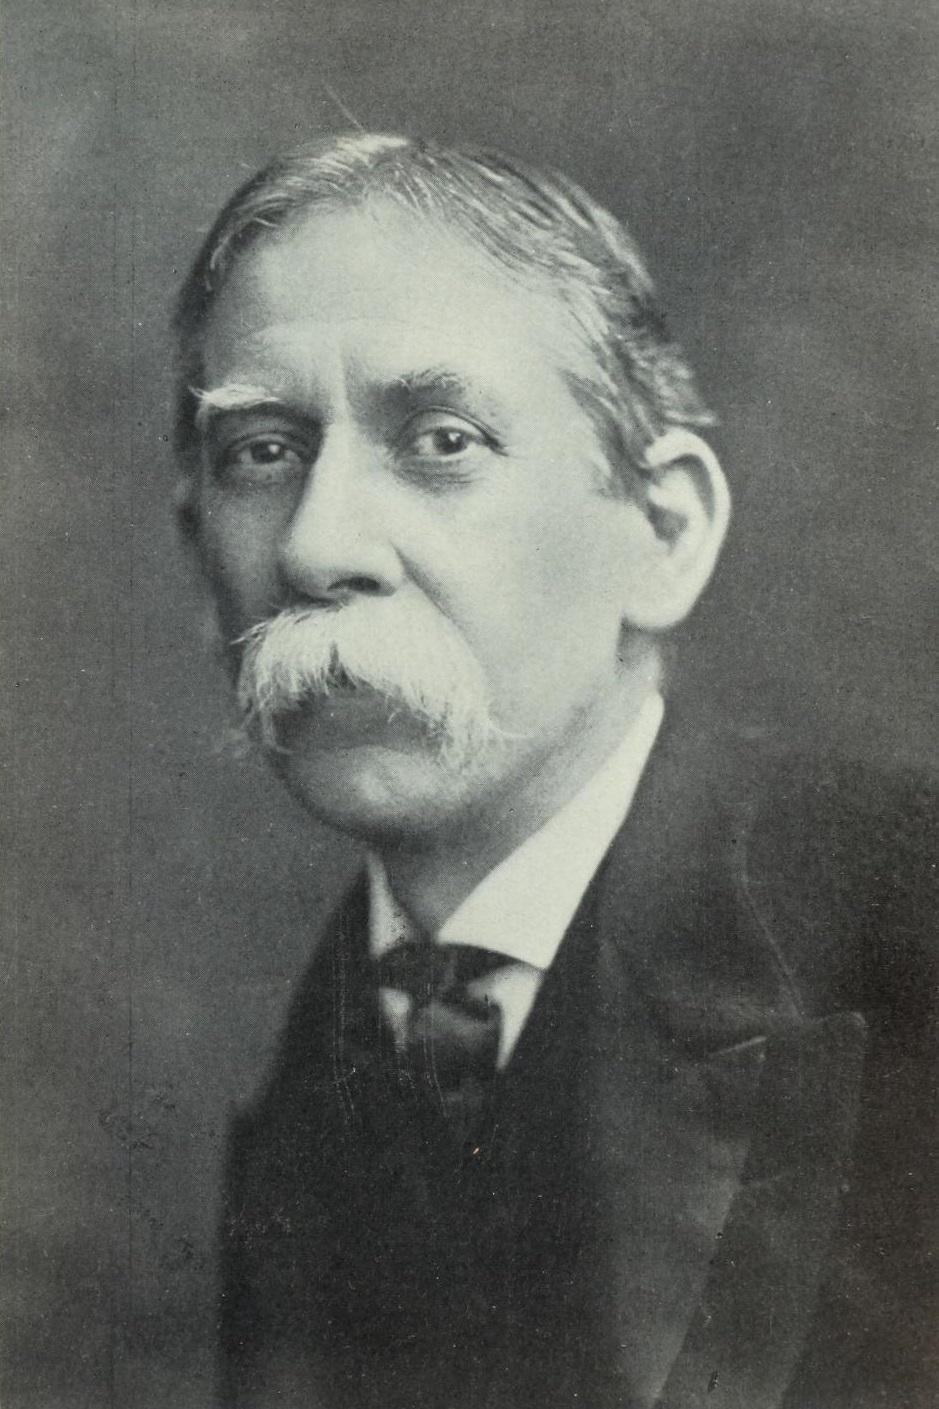 Portrait of Talcott Williams.